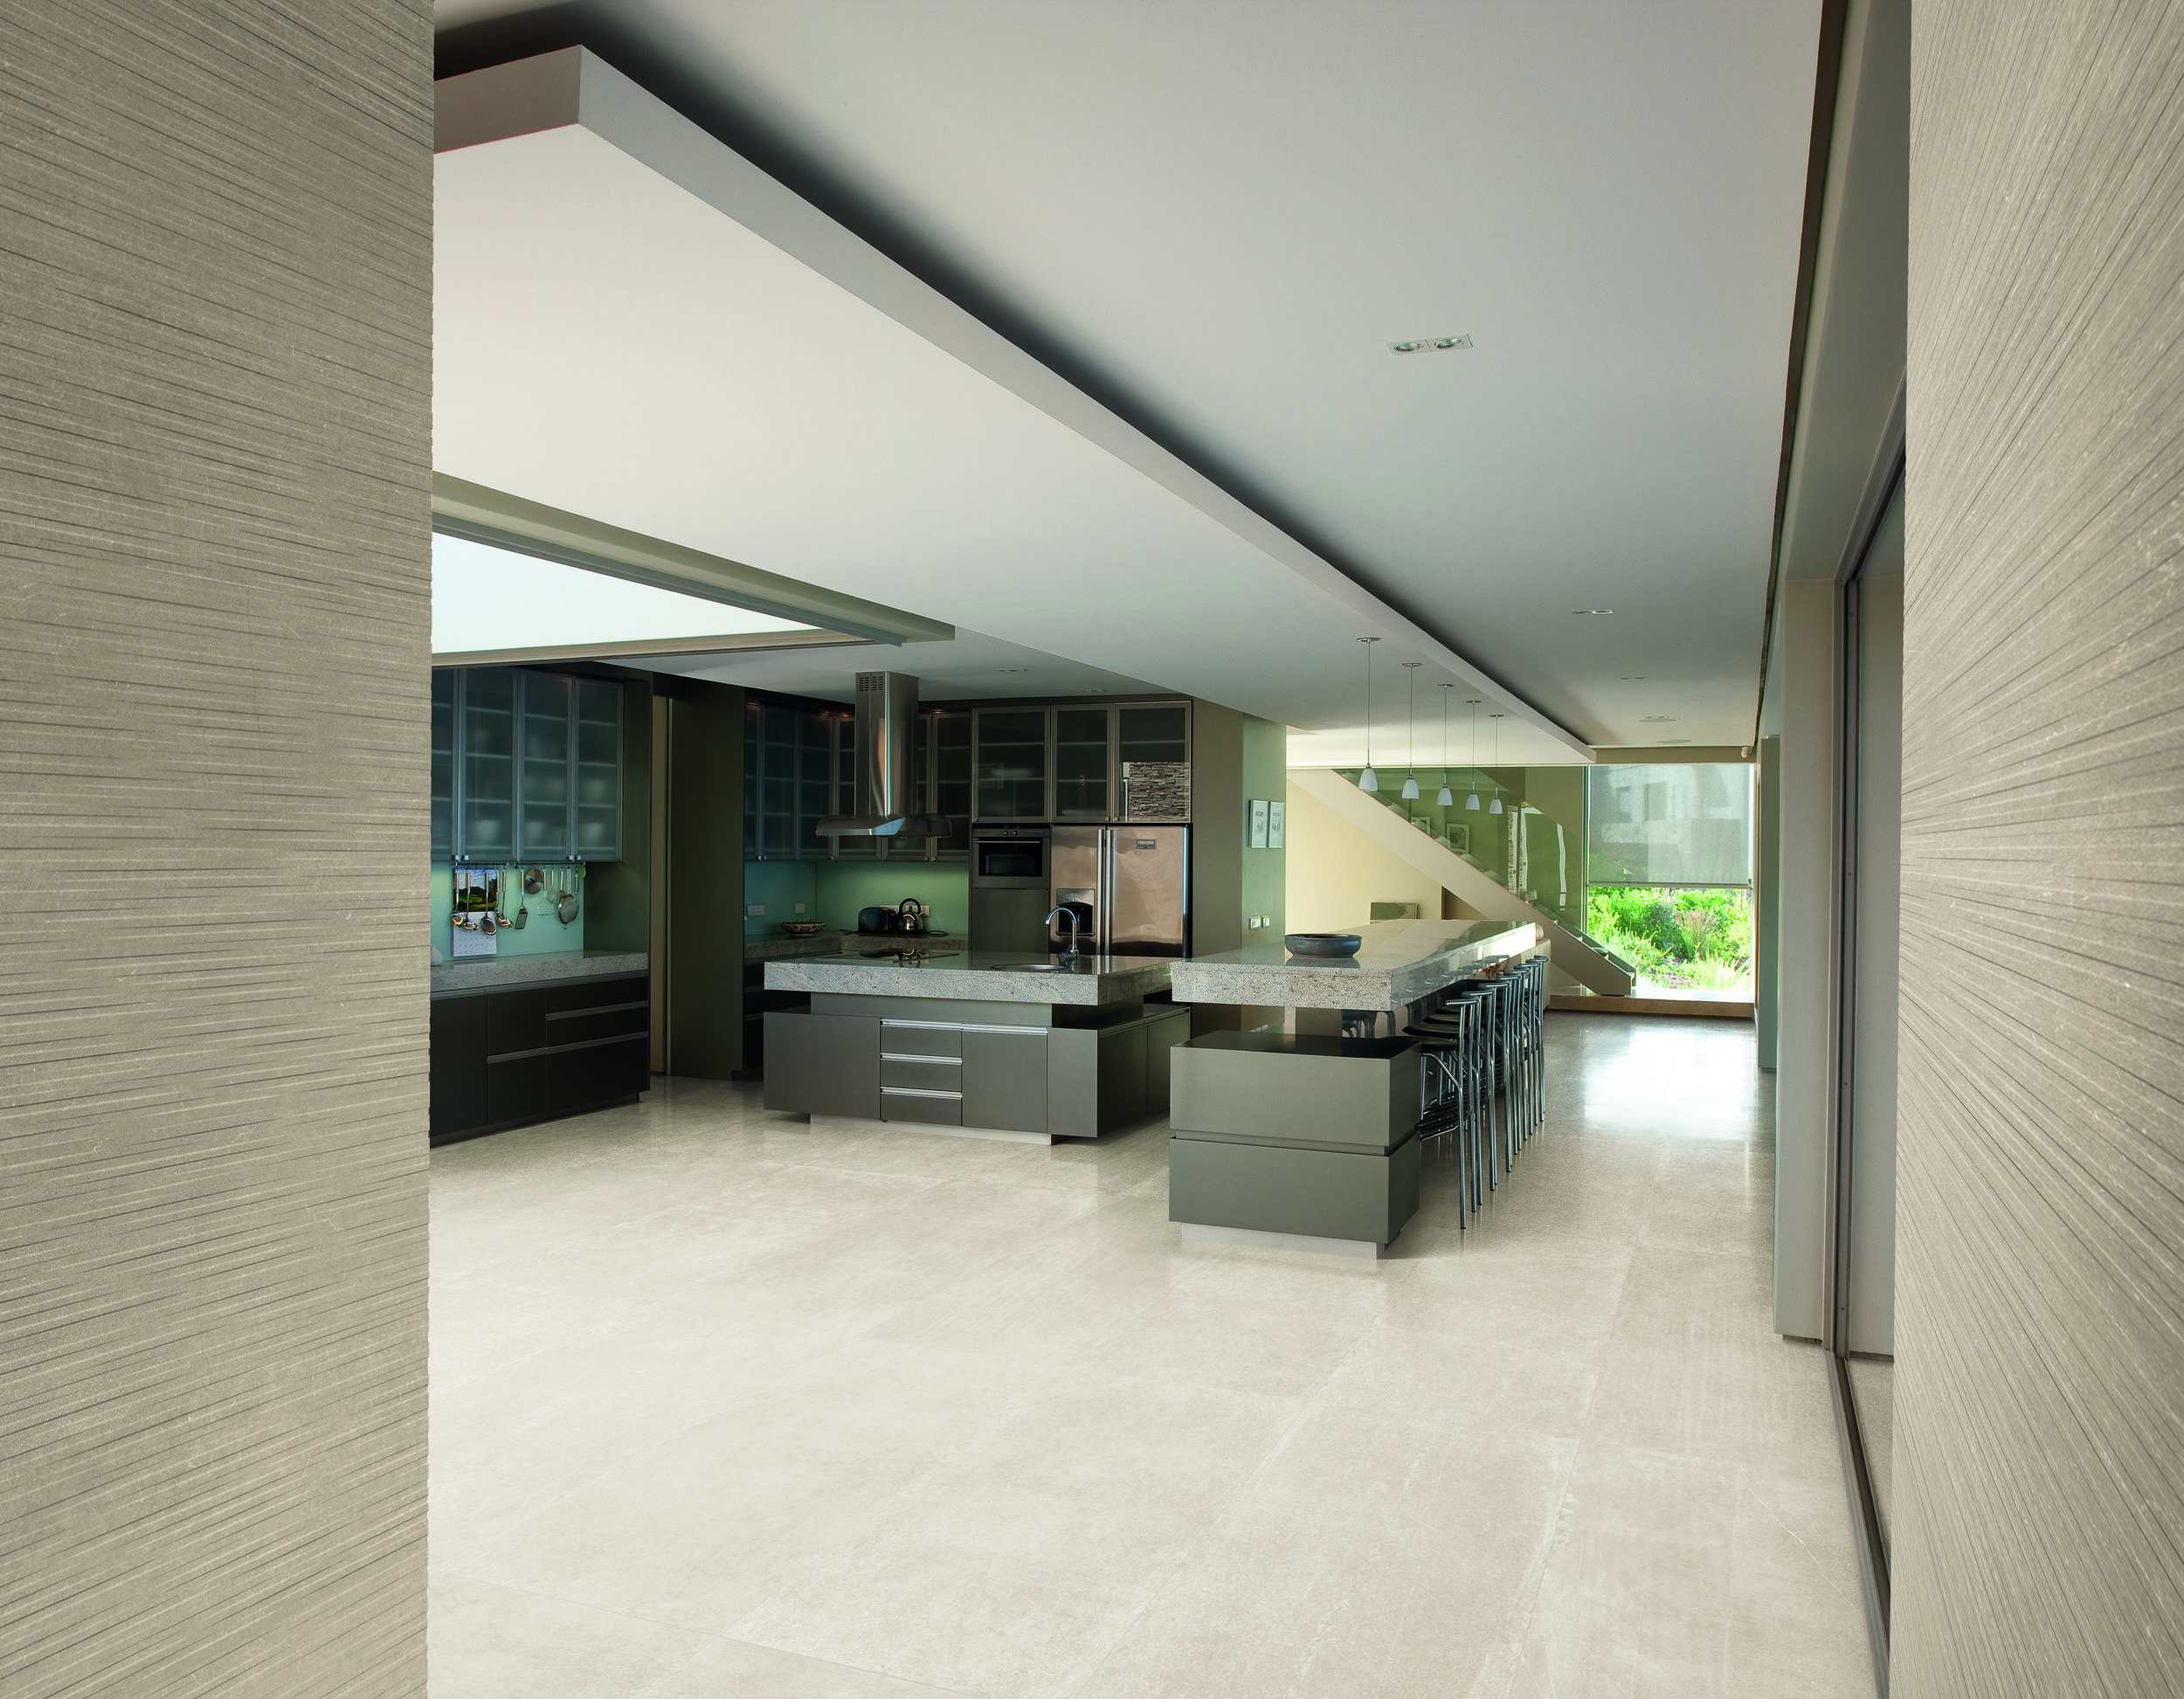 Limestone White Lapp 60x120 Amb Cucina.jpg